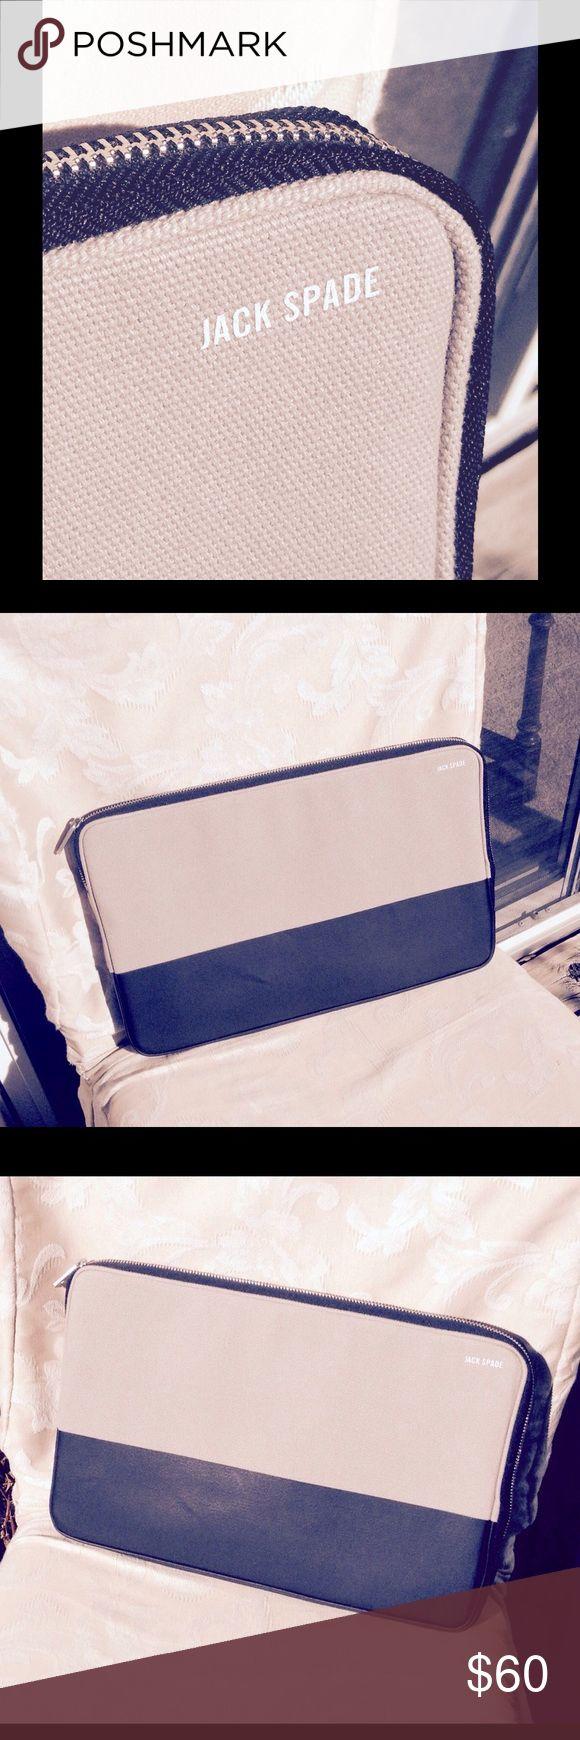 🚂🚂. Jack Spade laptop bag Men's two tone Jack Spade laptop bag.  You know the brand. Jack Spade Bags Laptop Bags